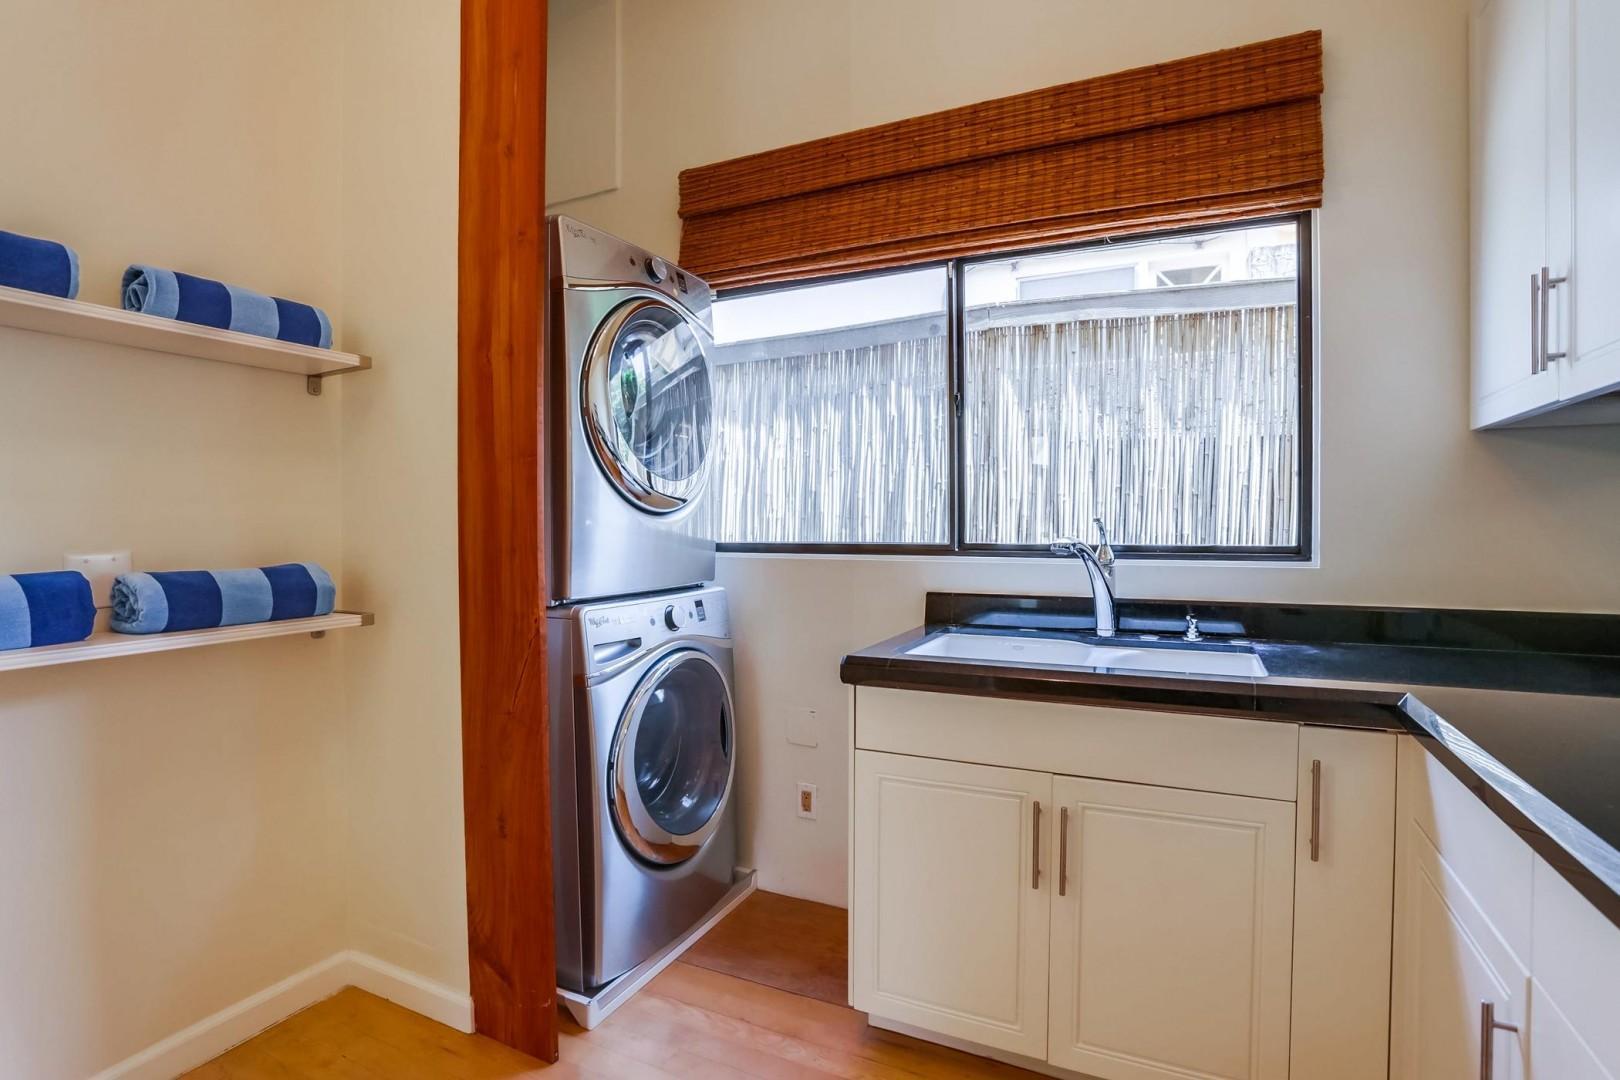 Full-size stack laundry